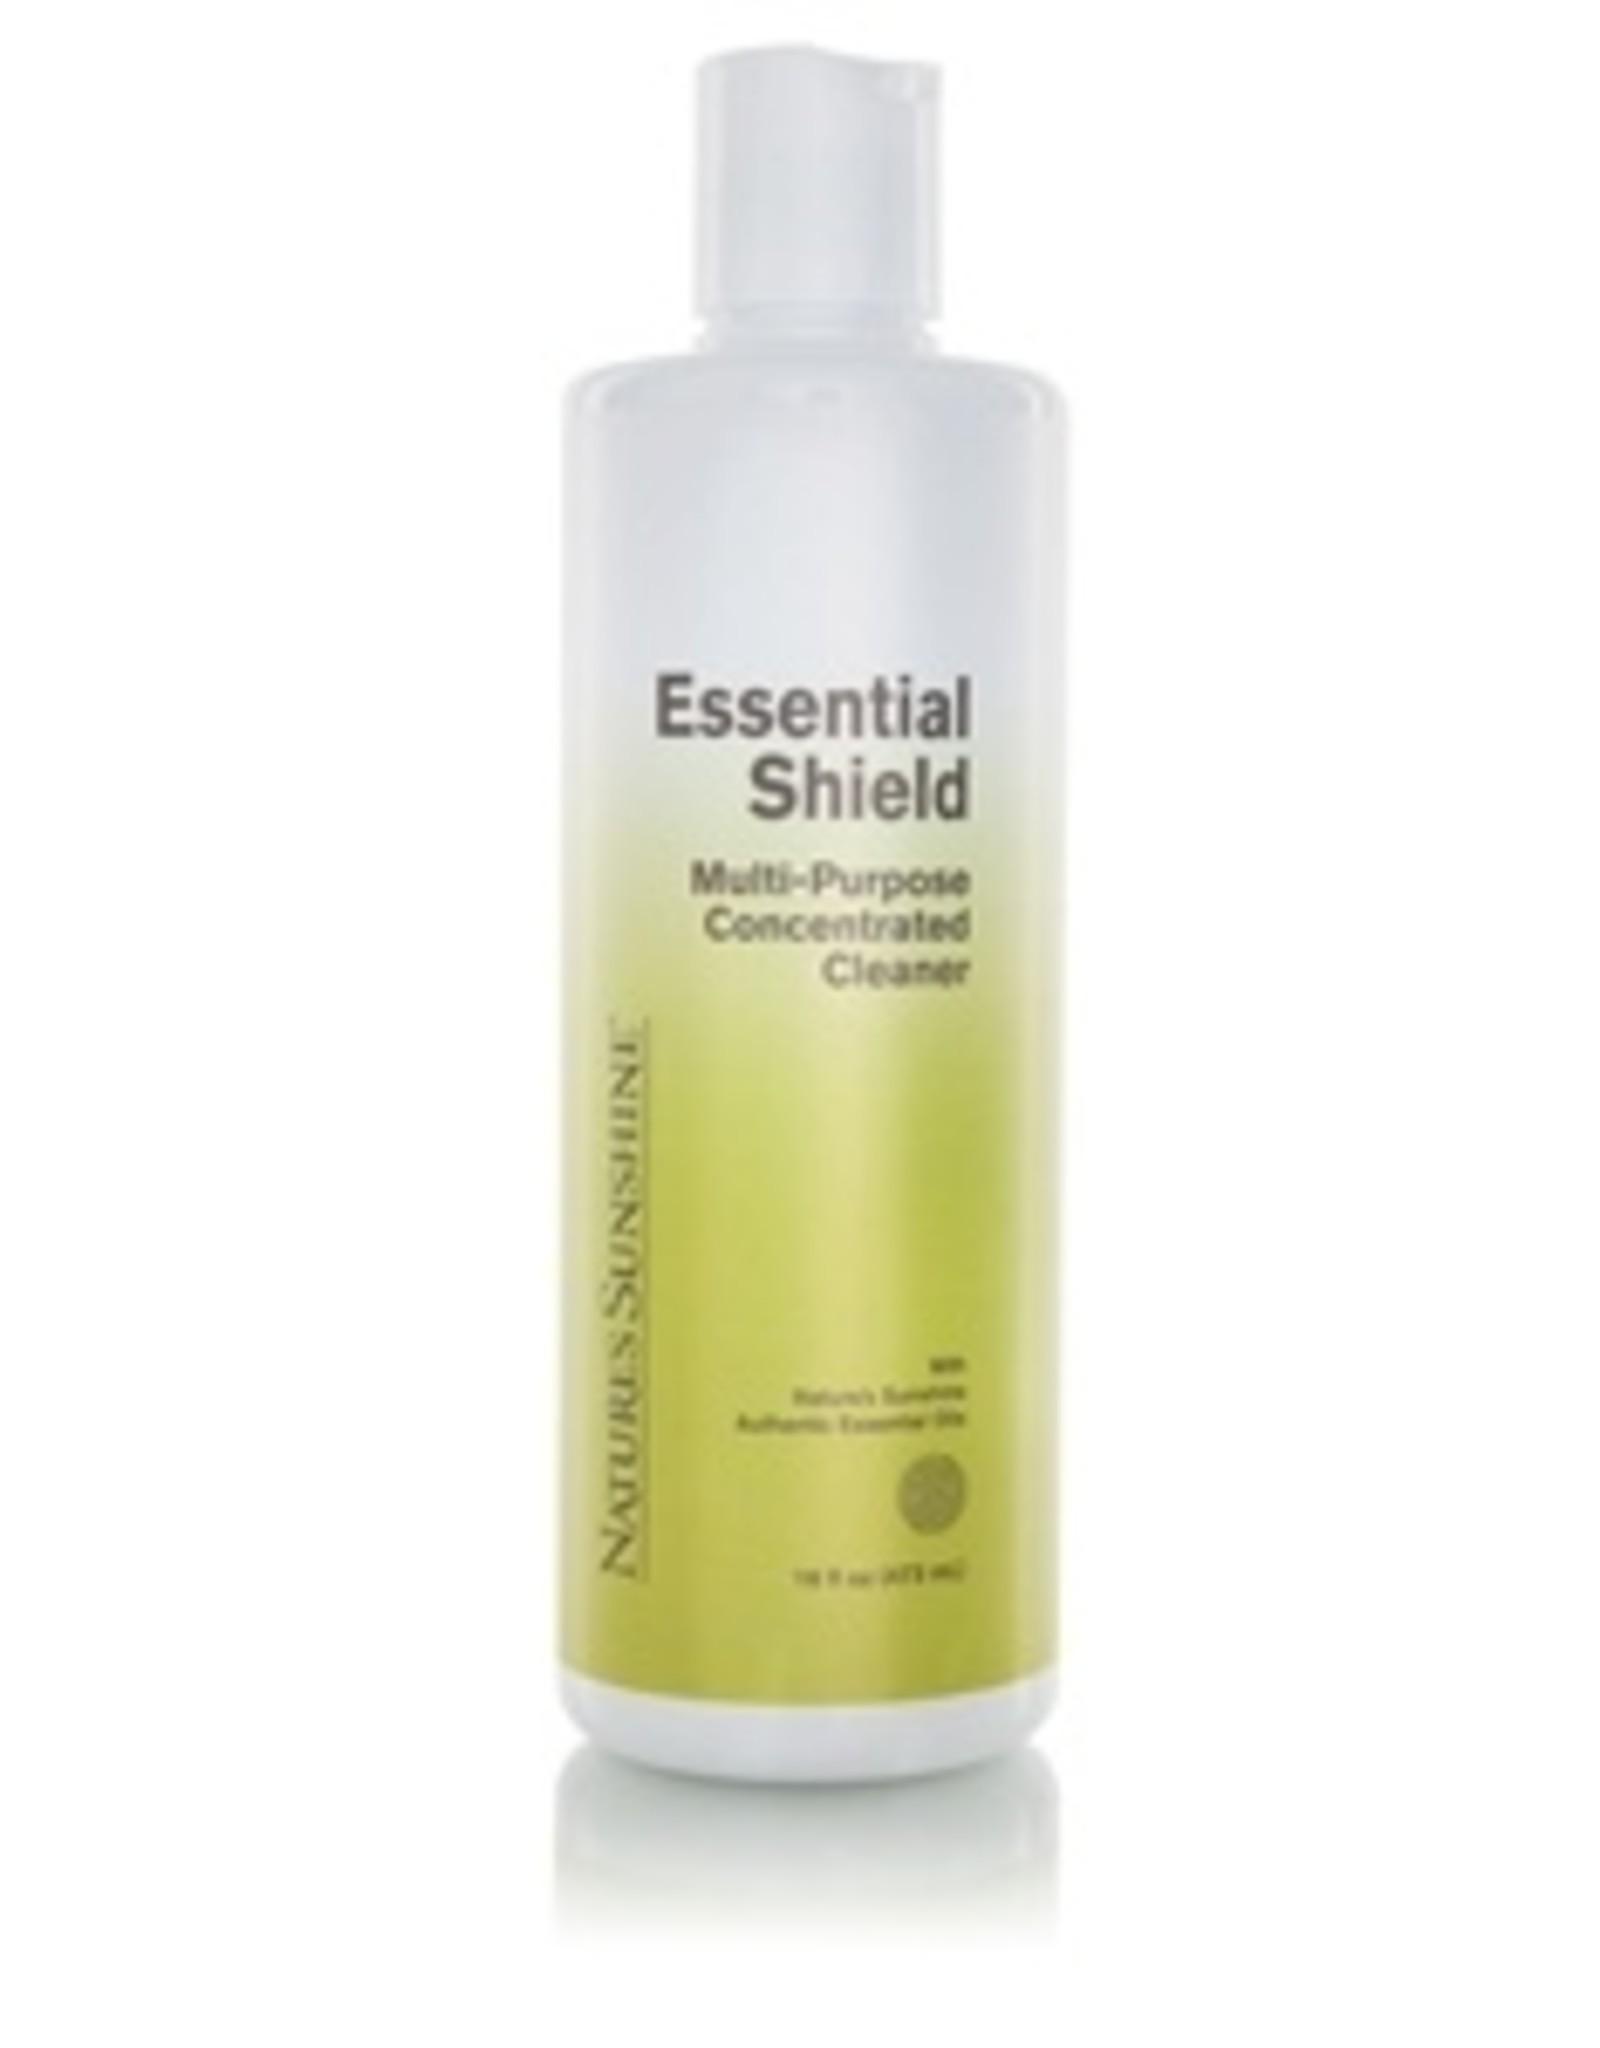 Nature's Sunshine Essential Shield Multi-Purpose Cleaner